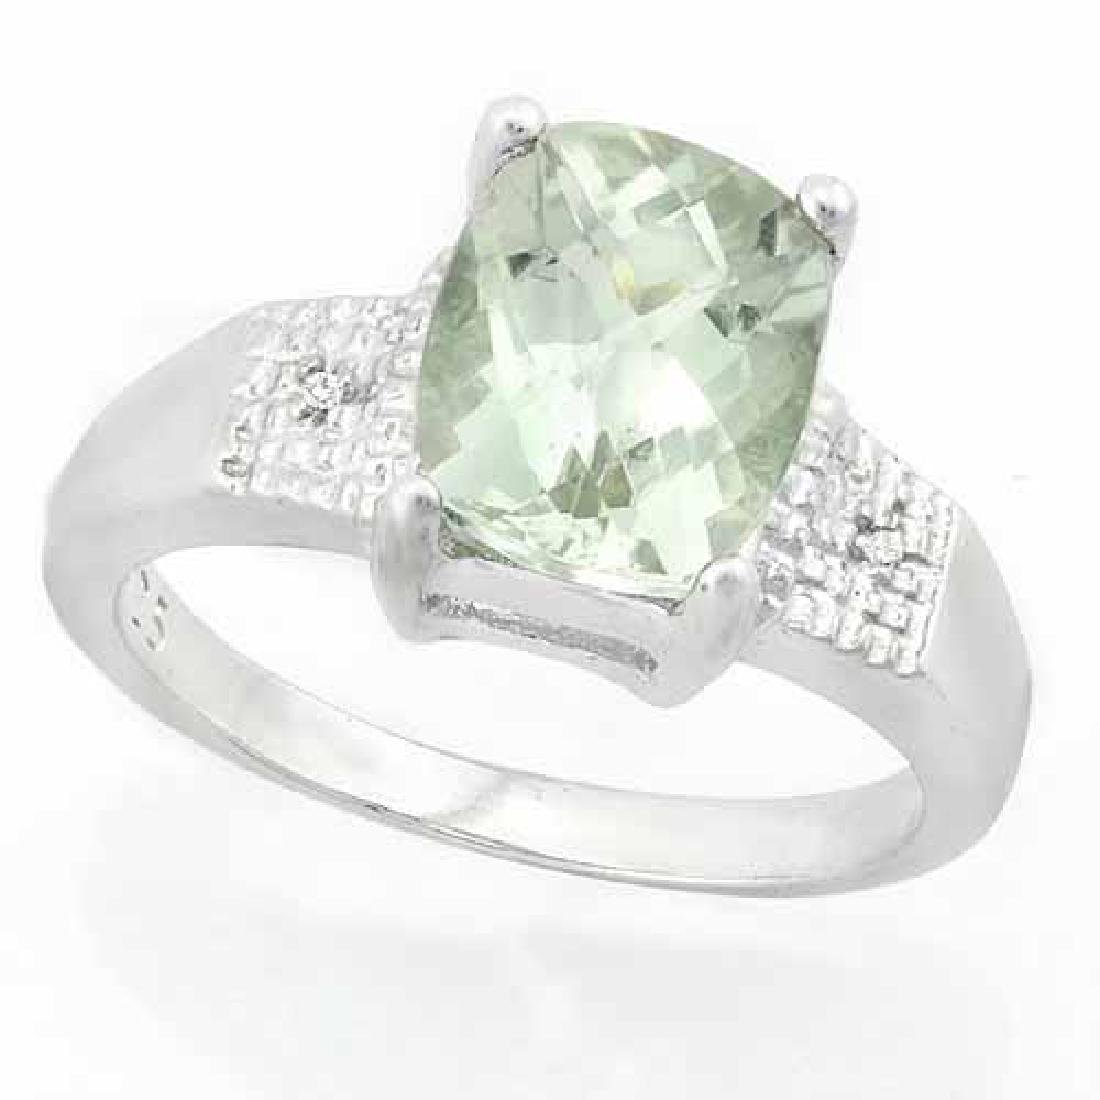 1.50 CARAT CREATED SAPPHIRE & (56 PCS) CREATED DIAMOND